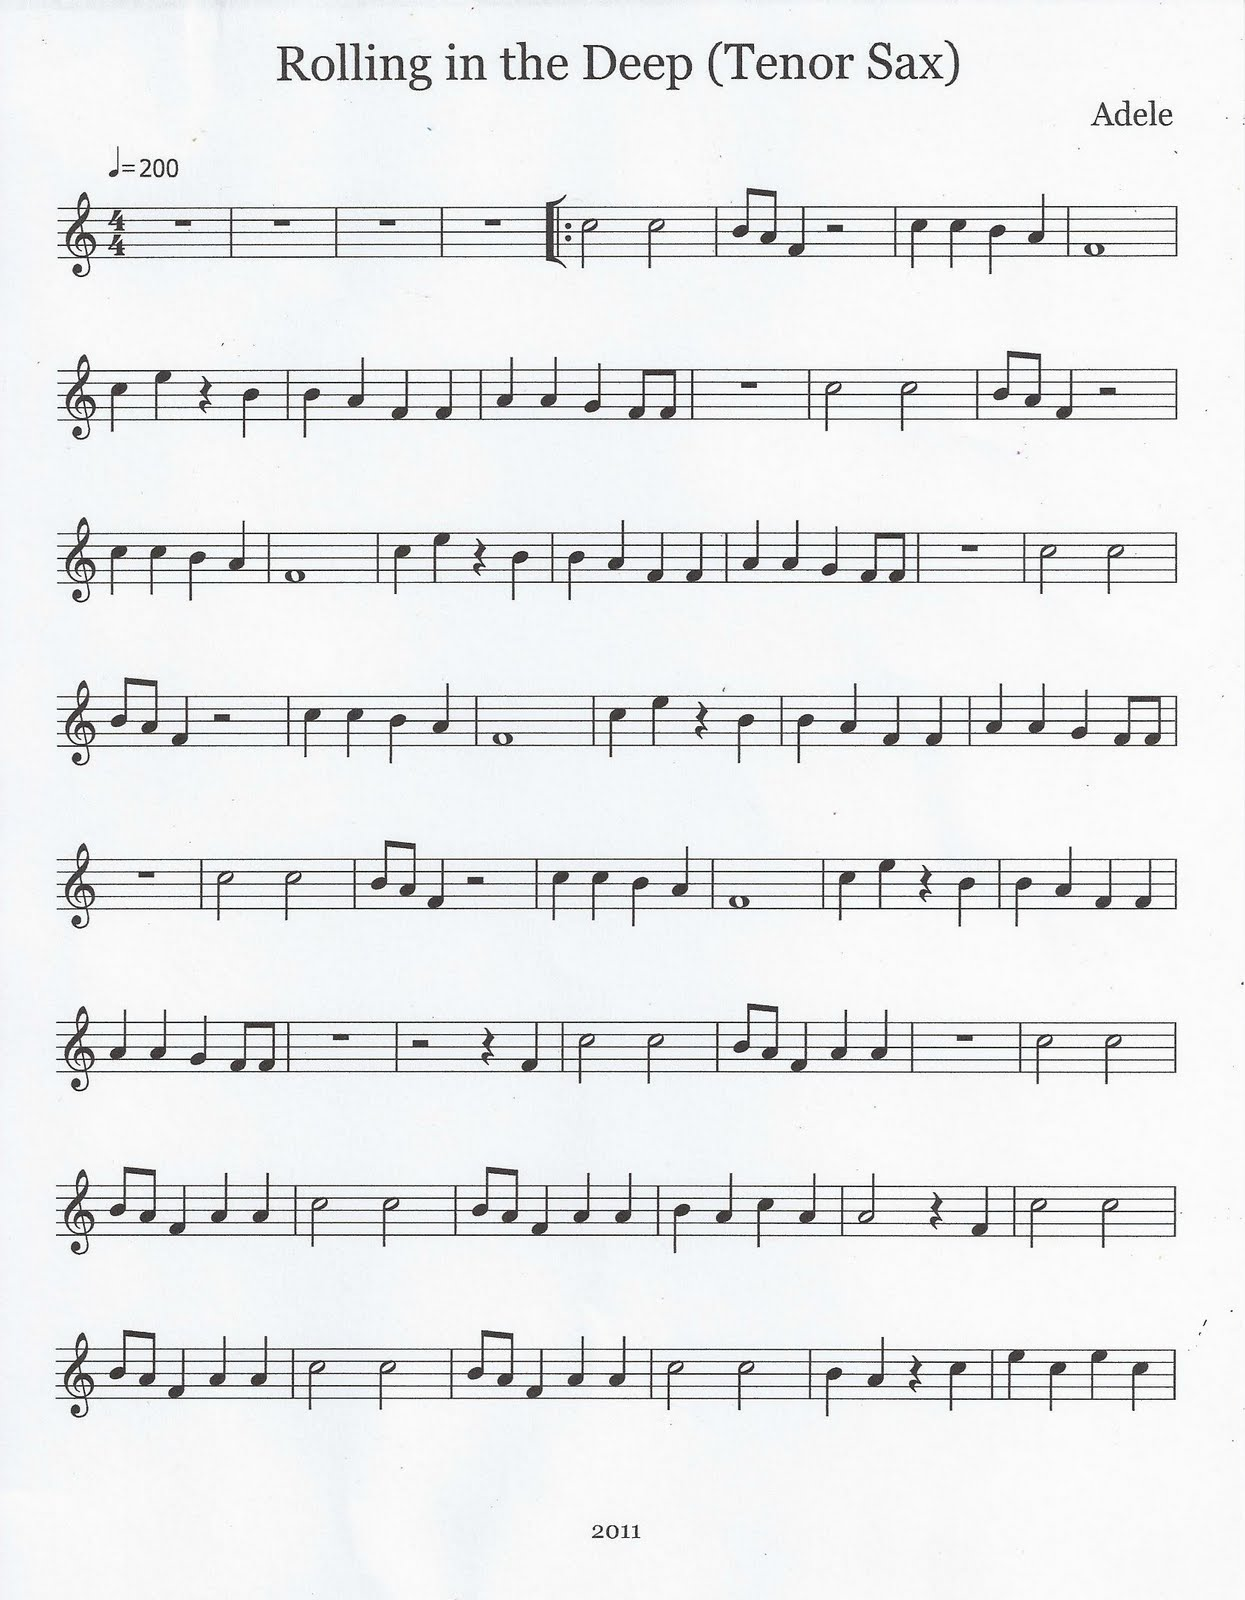 http://3.bp.blogspot.com/-JNHCoim9re4/TgihfpnlUkI/AAAAAAAAAA0/2vz2fAcD_AA/s1600/Rolling+in+the+Deep+tenor+sax+%25281%2529.jpg